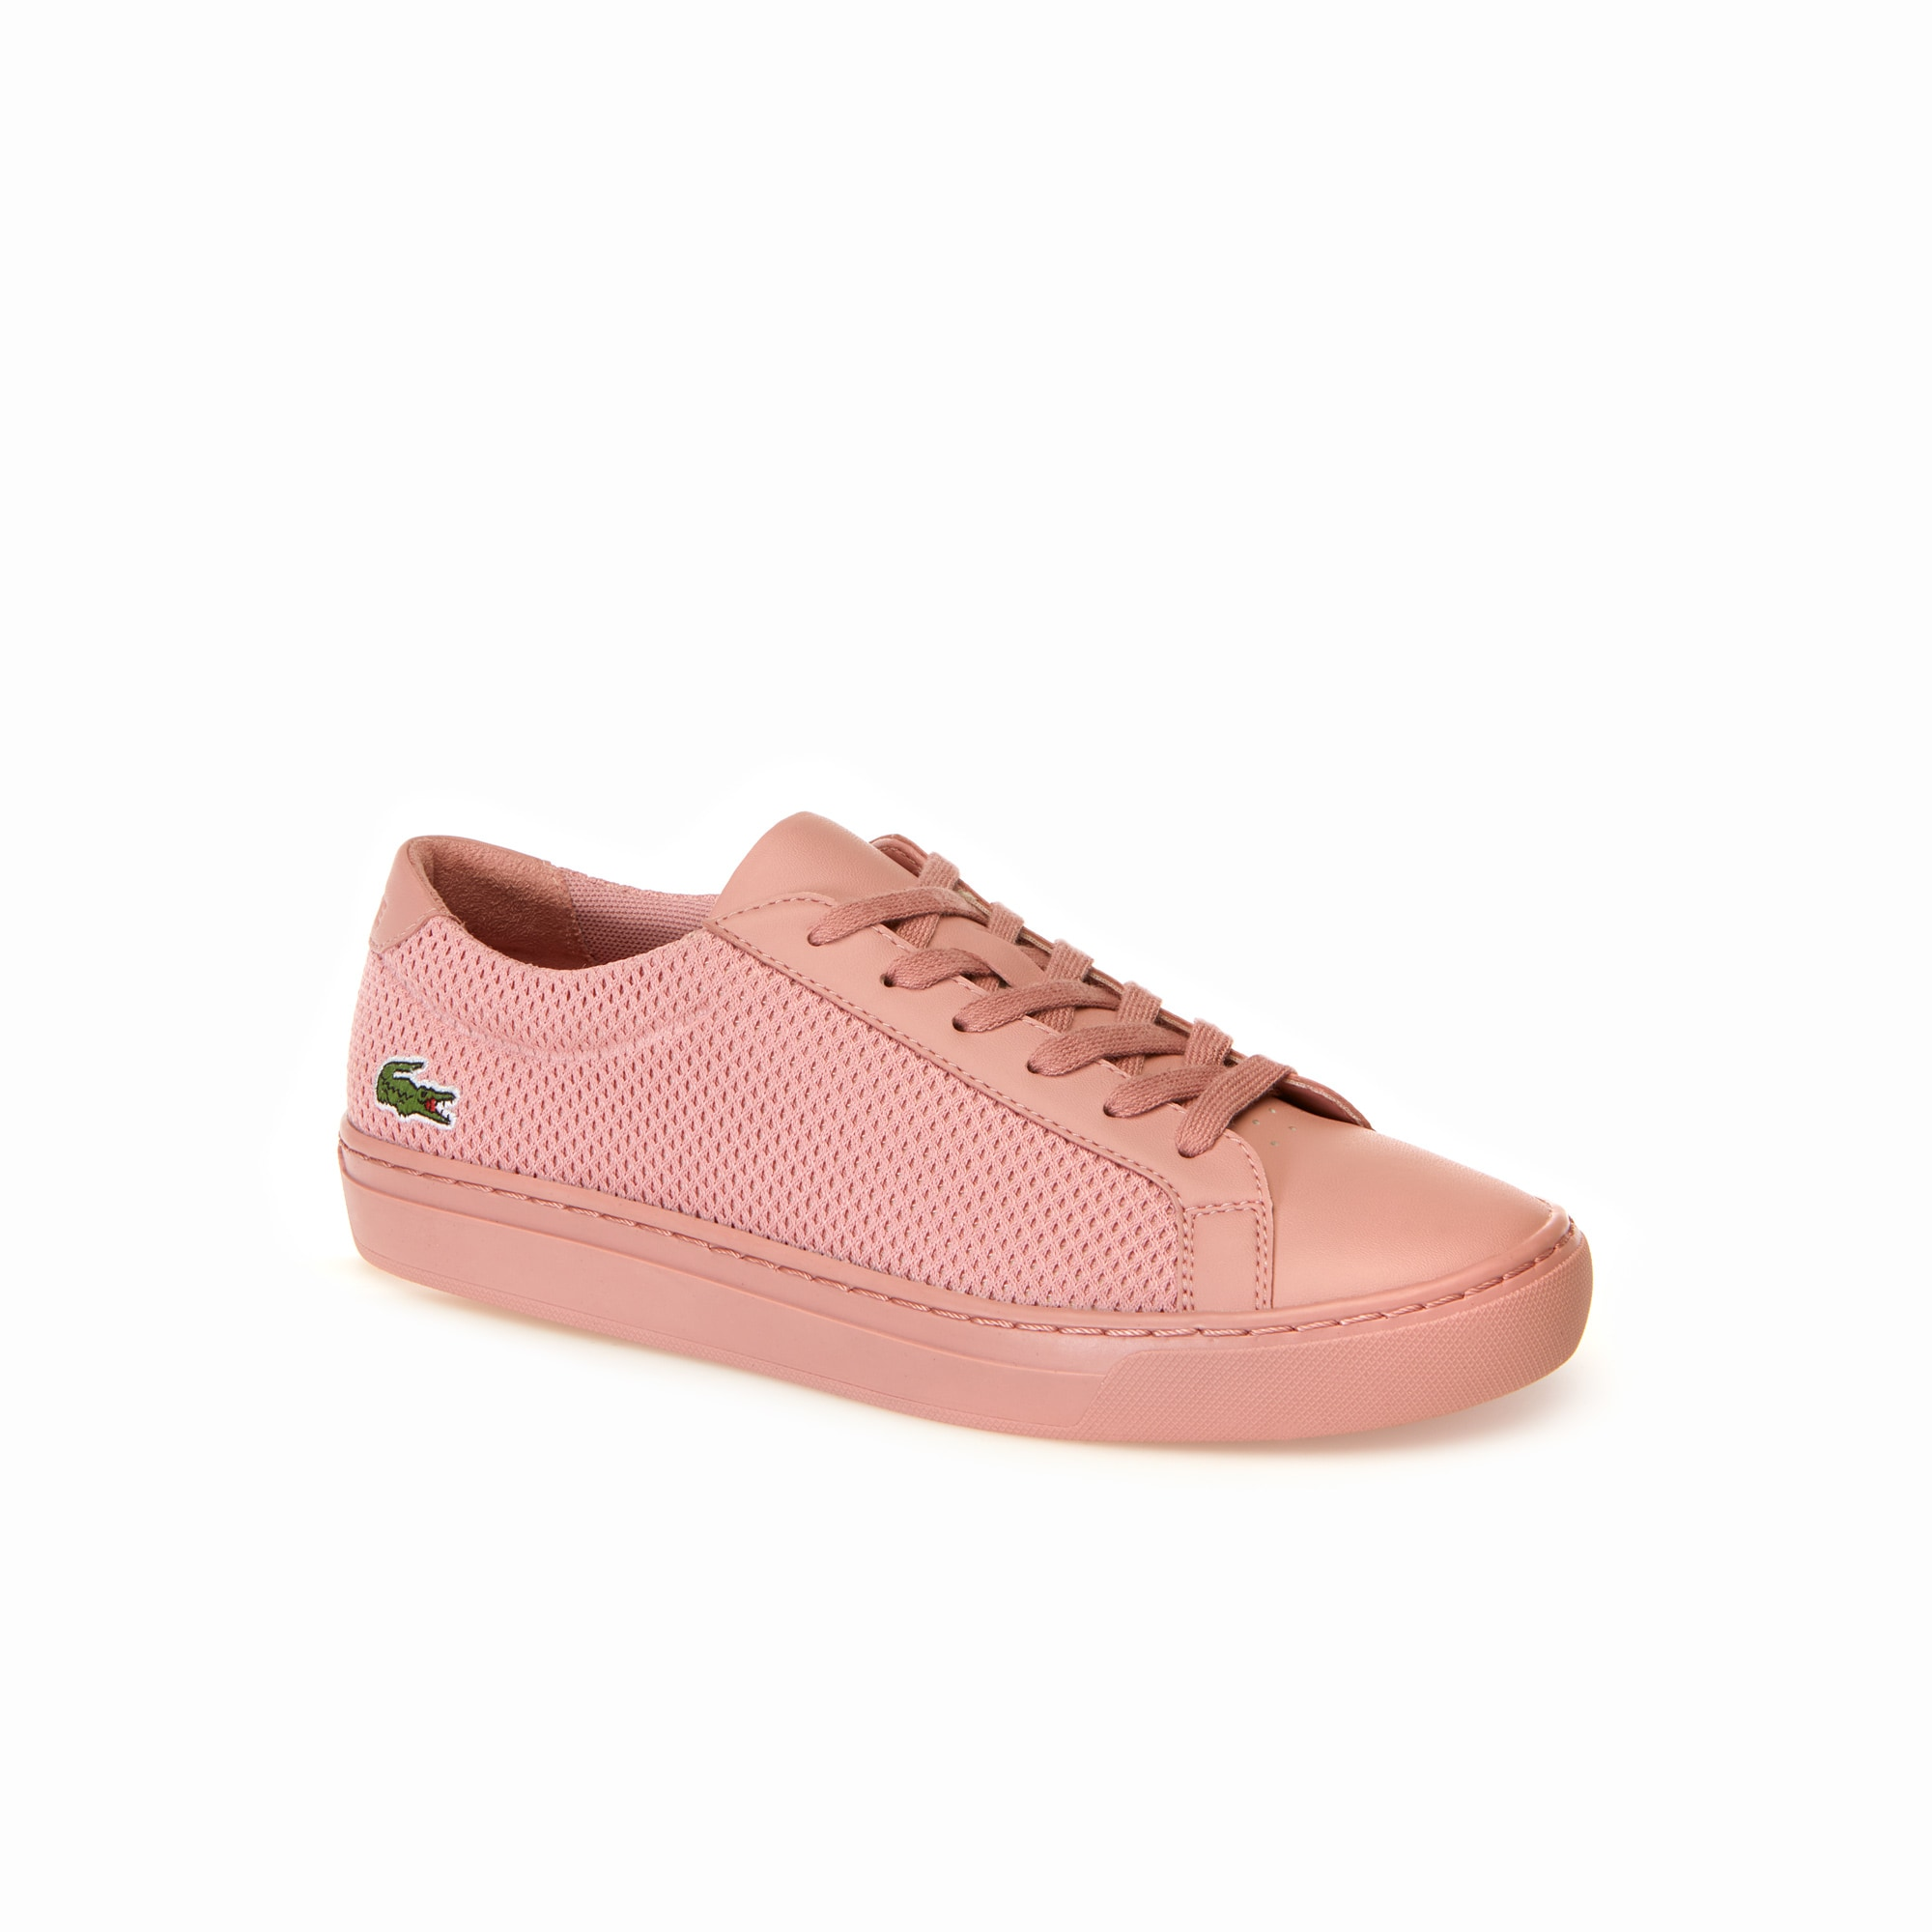 Zapatillas de mujer L.12.12 Light-WT de material textil y piel